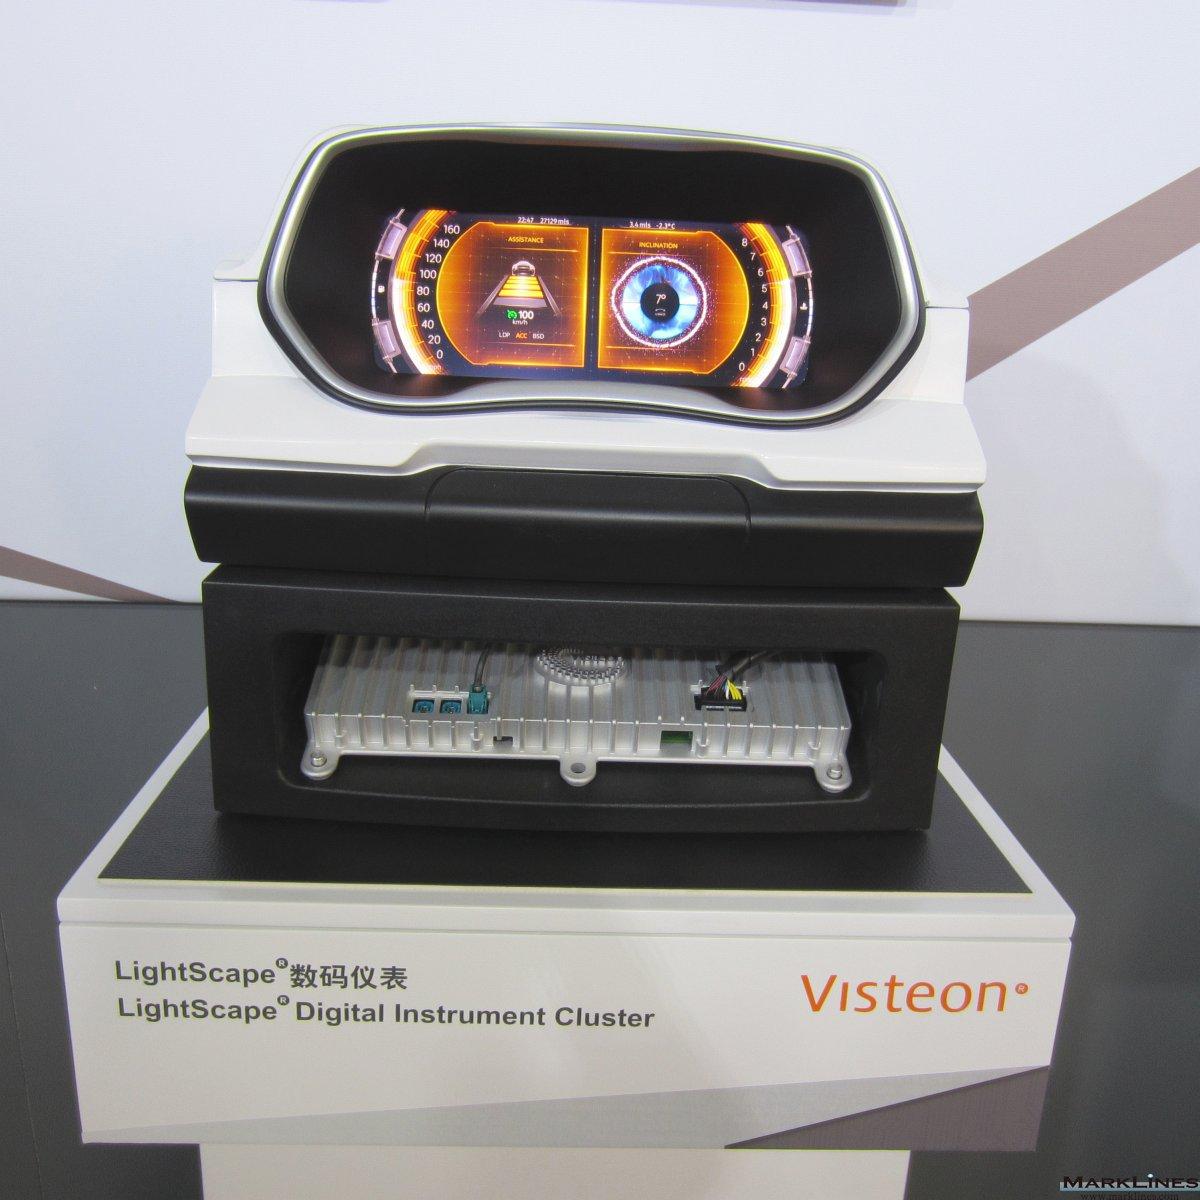 Visteon Corporation Marklines Automotive Industry Portal Project For 20 Or 40 Watt Fluorescent Tubes 8211 Inverter Logo